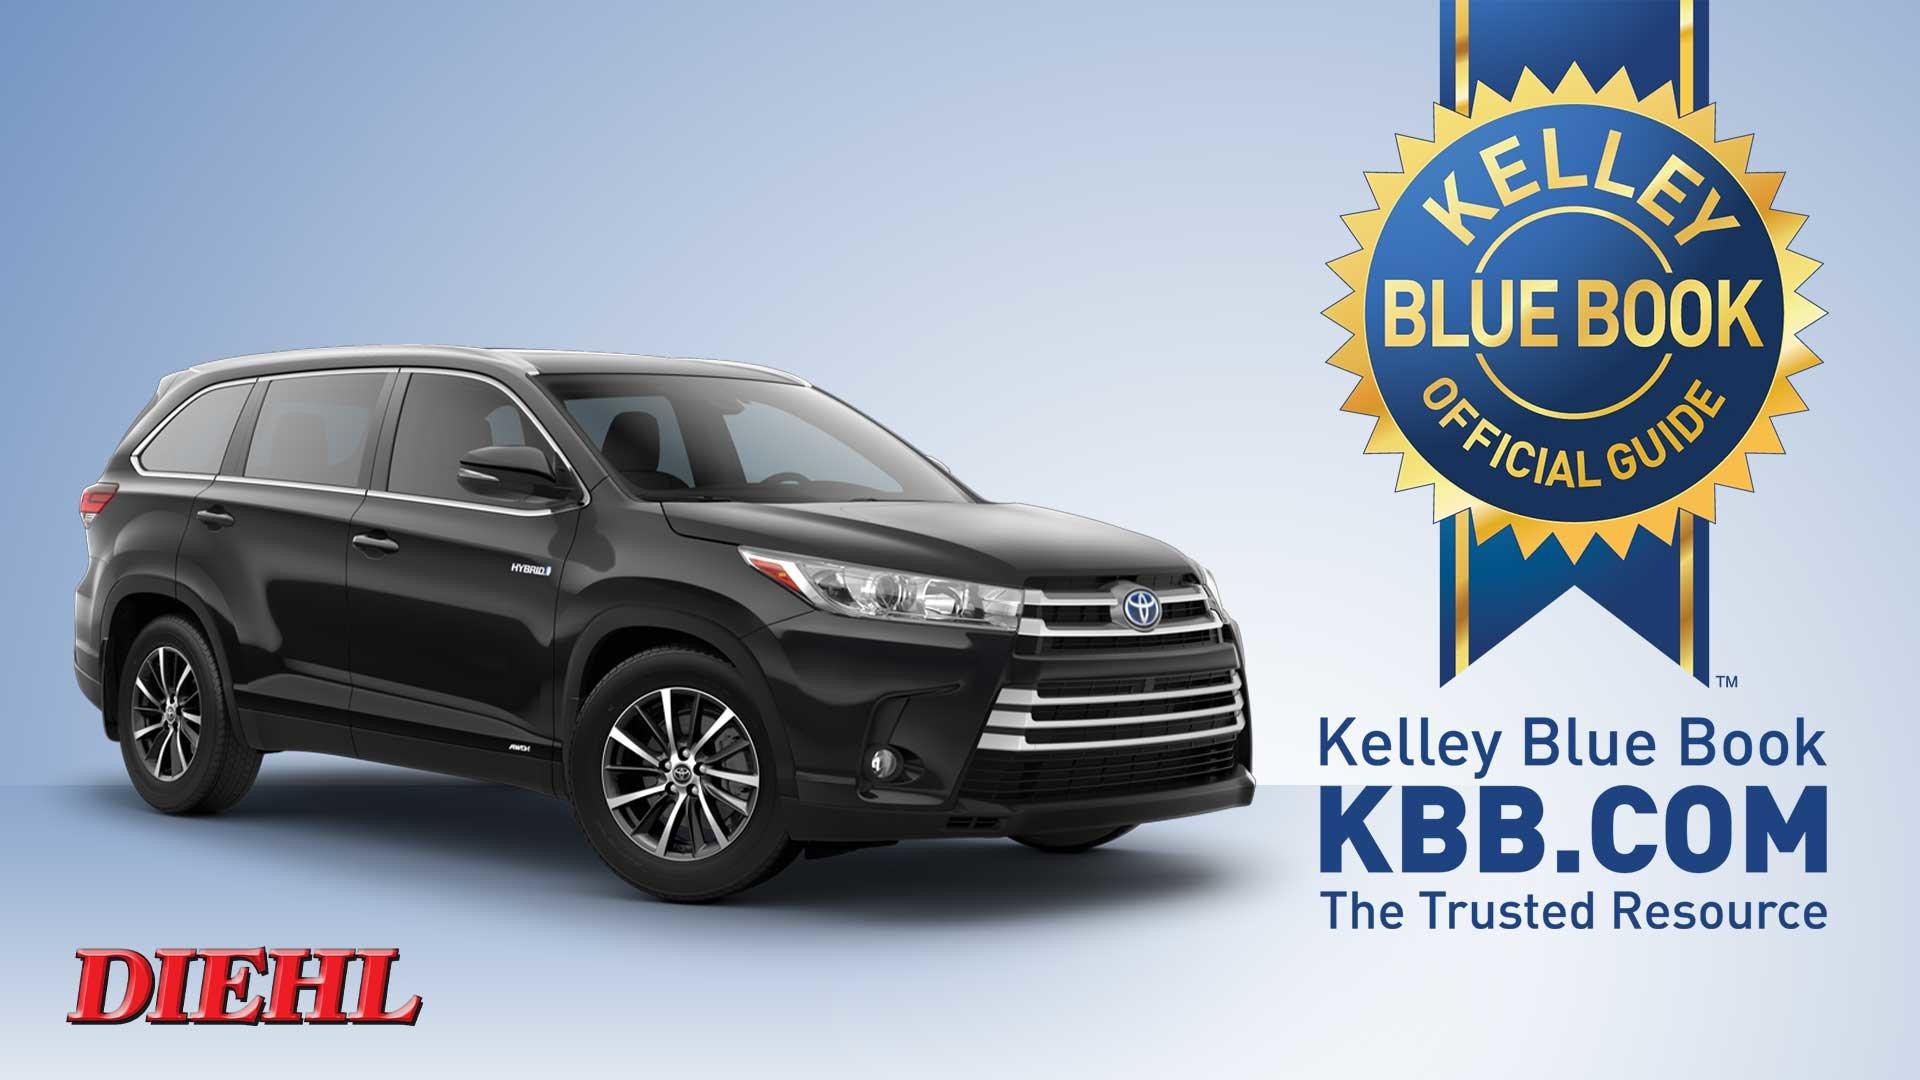 Kelley Blue Book Jeep >> Kelley Blue Book Awards 2019 Diehl Automotive Blog